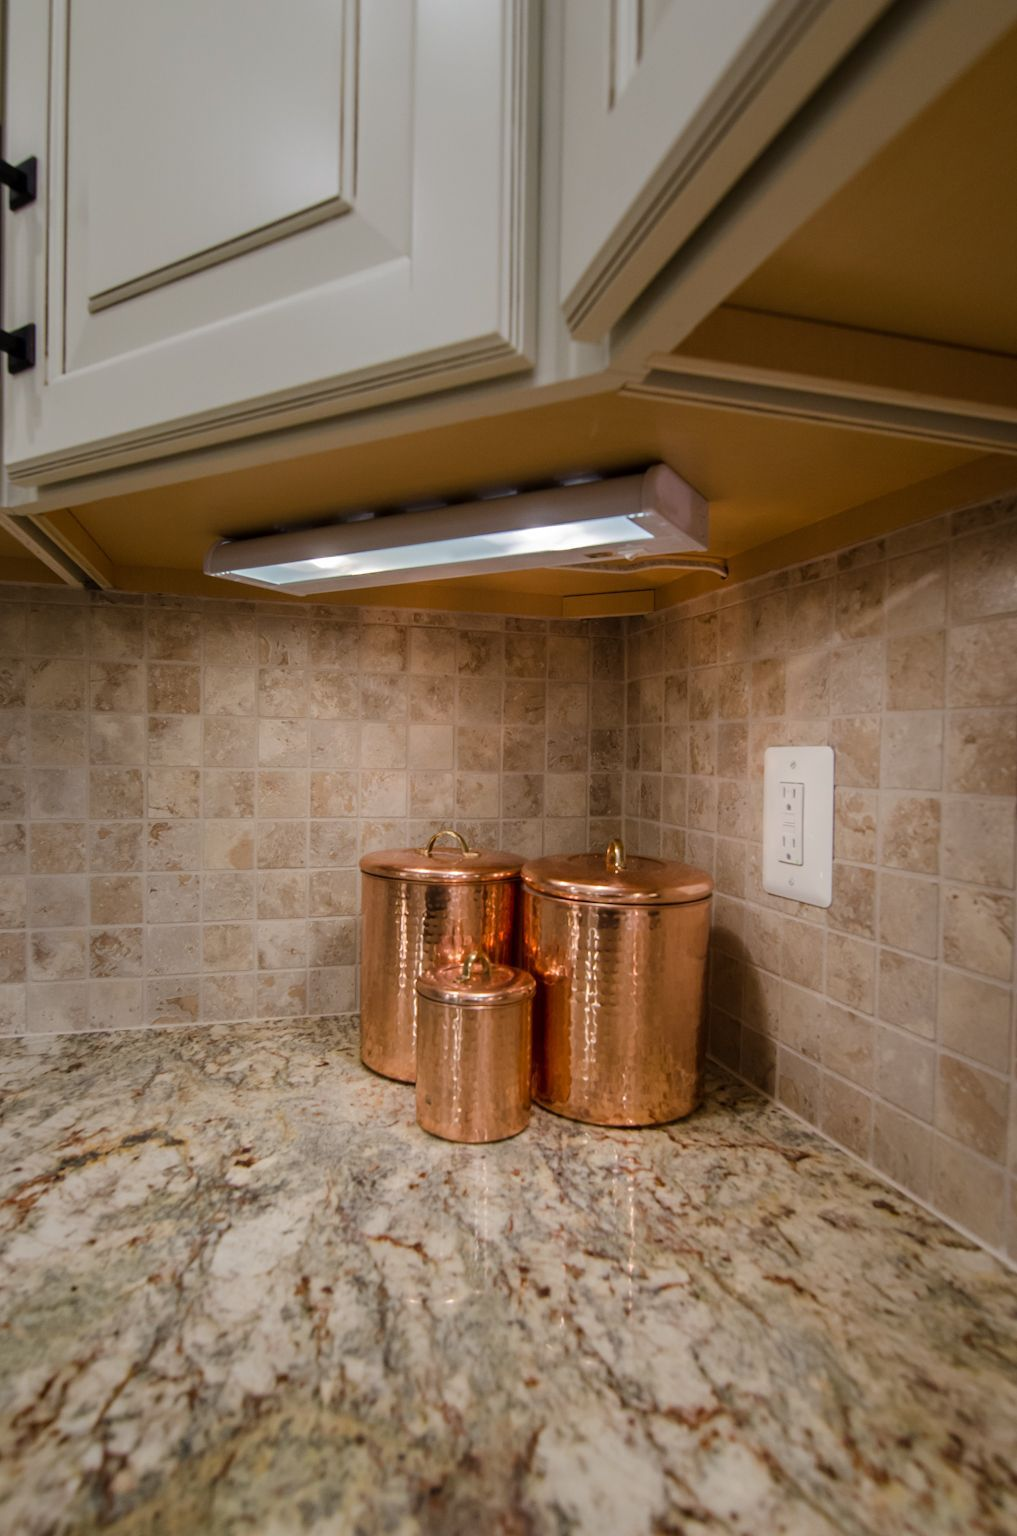 typhoon bordeaux granite   Favoritos in 2019   Kitchen ... on Typhoon Bordeaux Granite Backsplash Ideas  id=79899